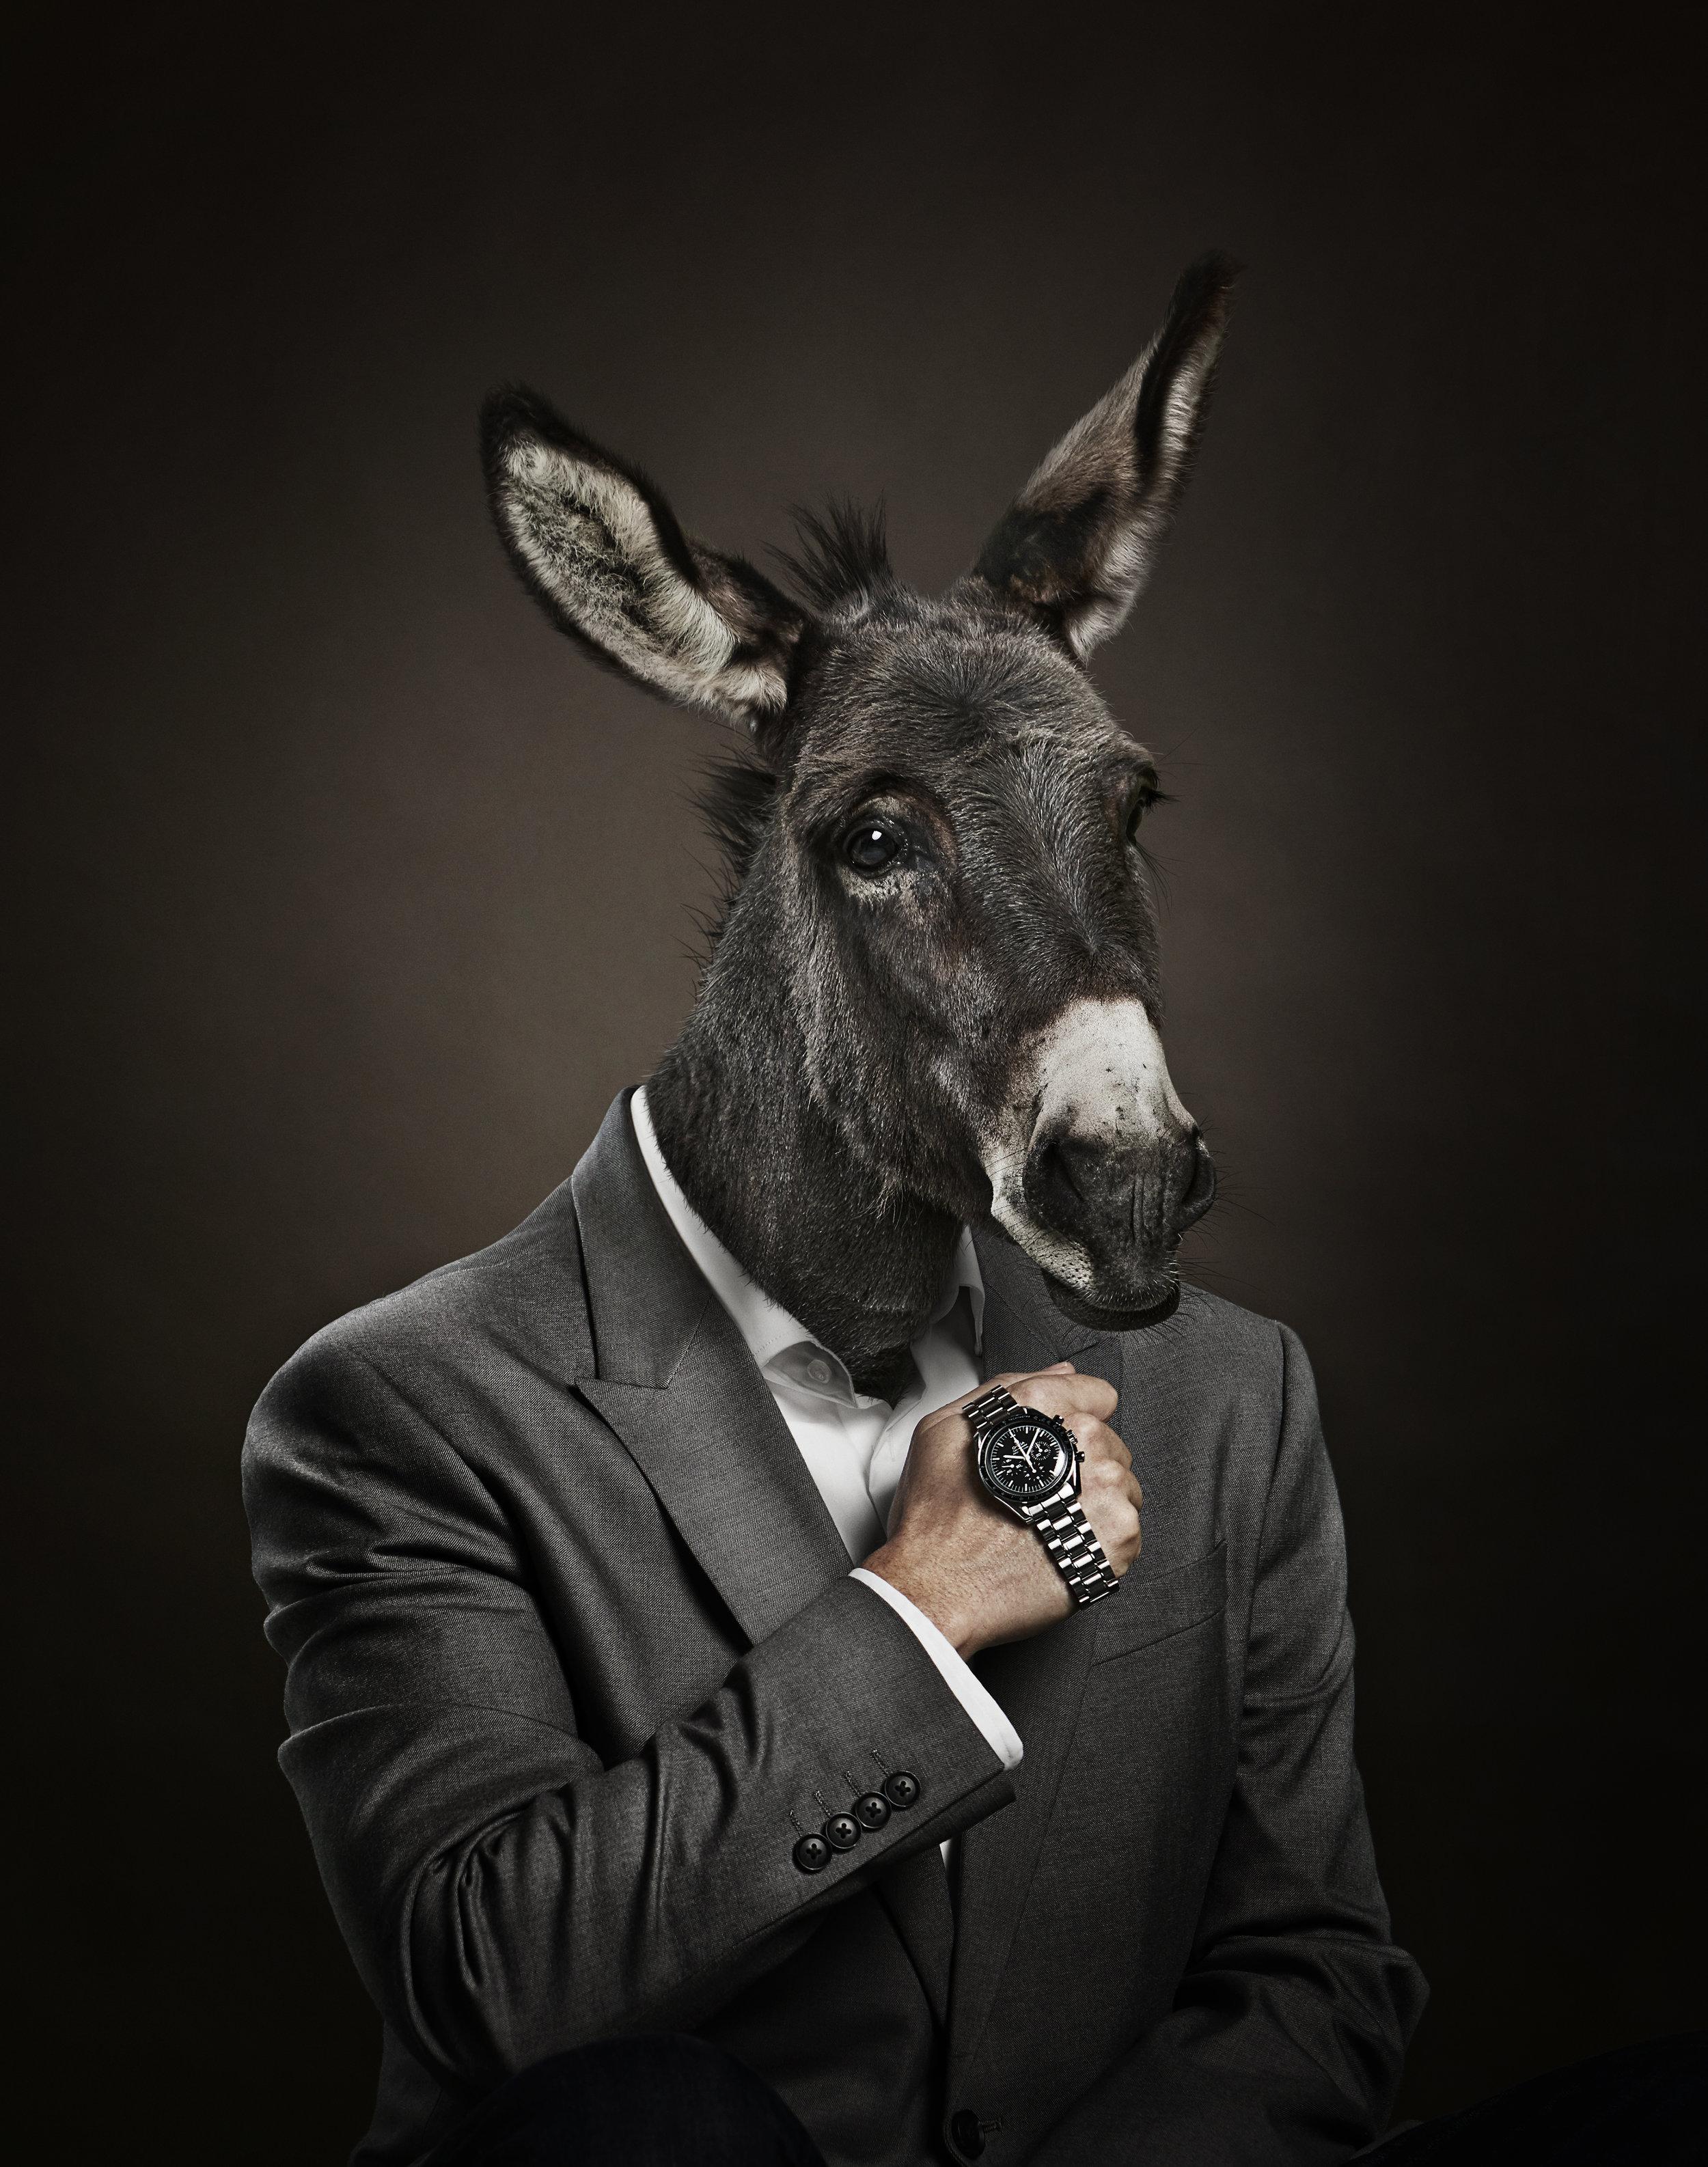 CC_TrustCamp_Donkey_d_forme.jpg